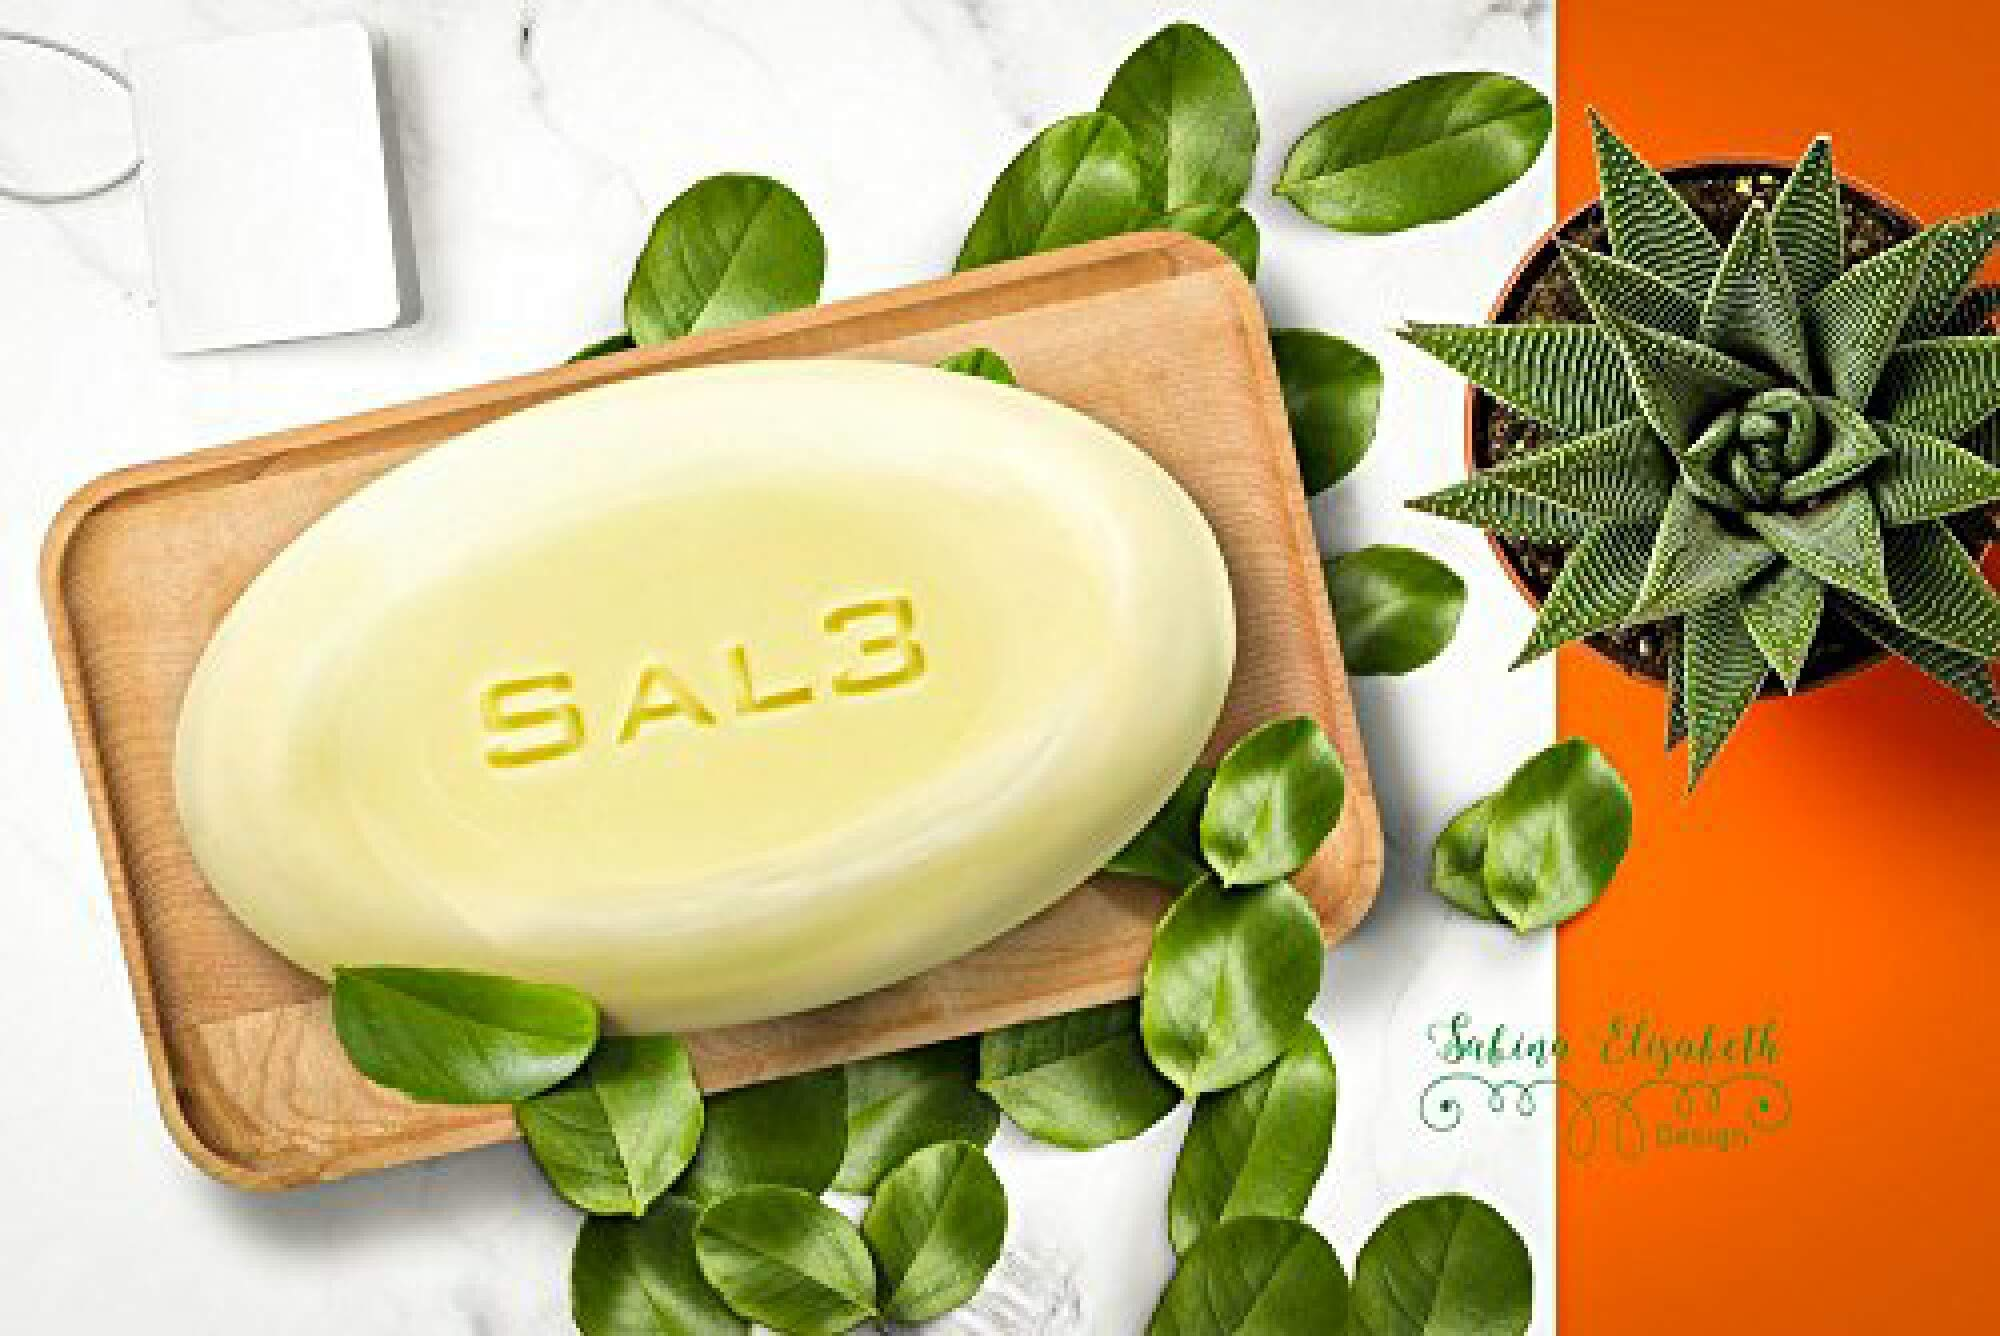 25 bar Dermatologist Pack - SAL3 Soap, 10% Sulfur, 3% Salicylic Acid by SAL3 (Image #5)